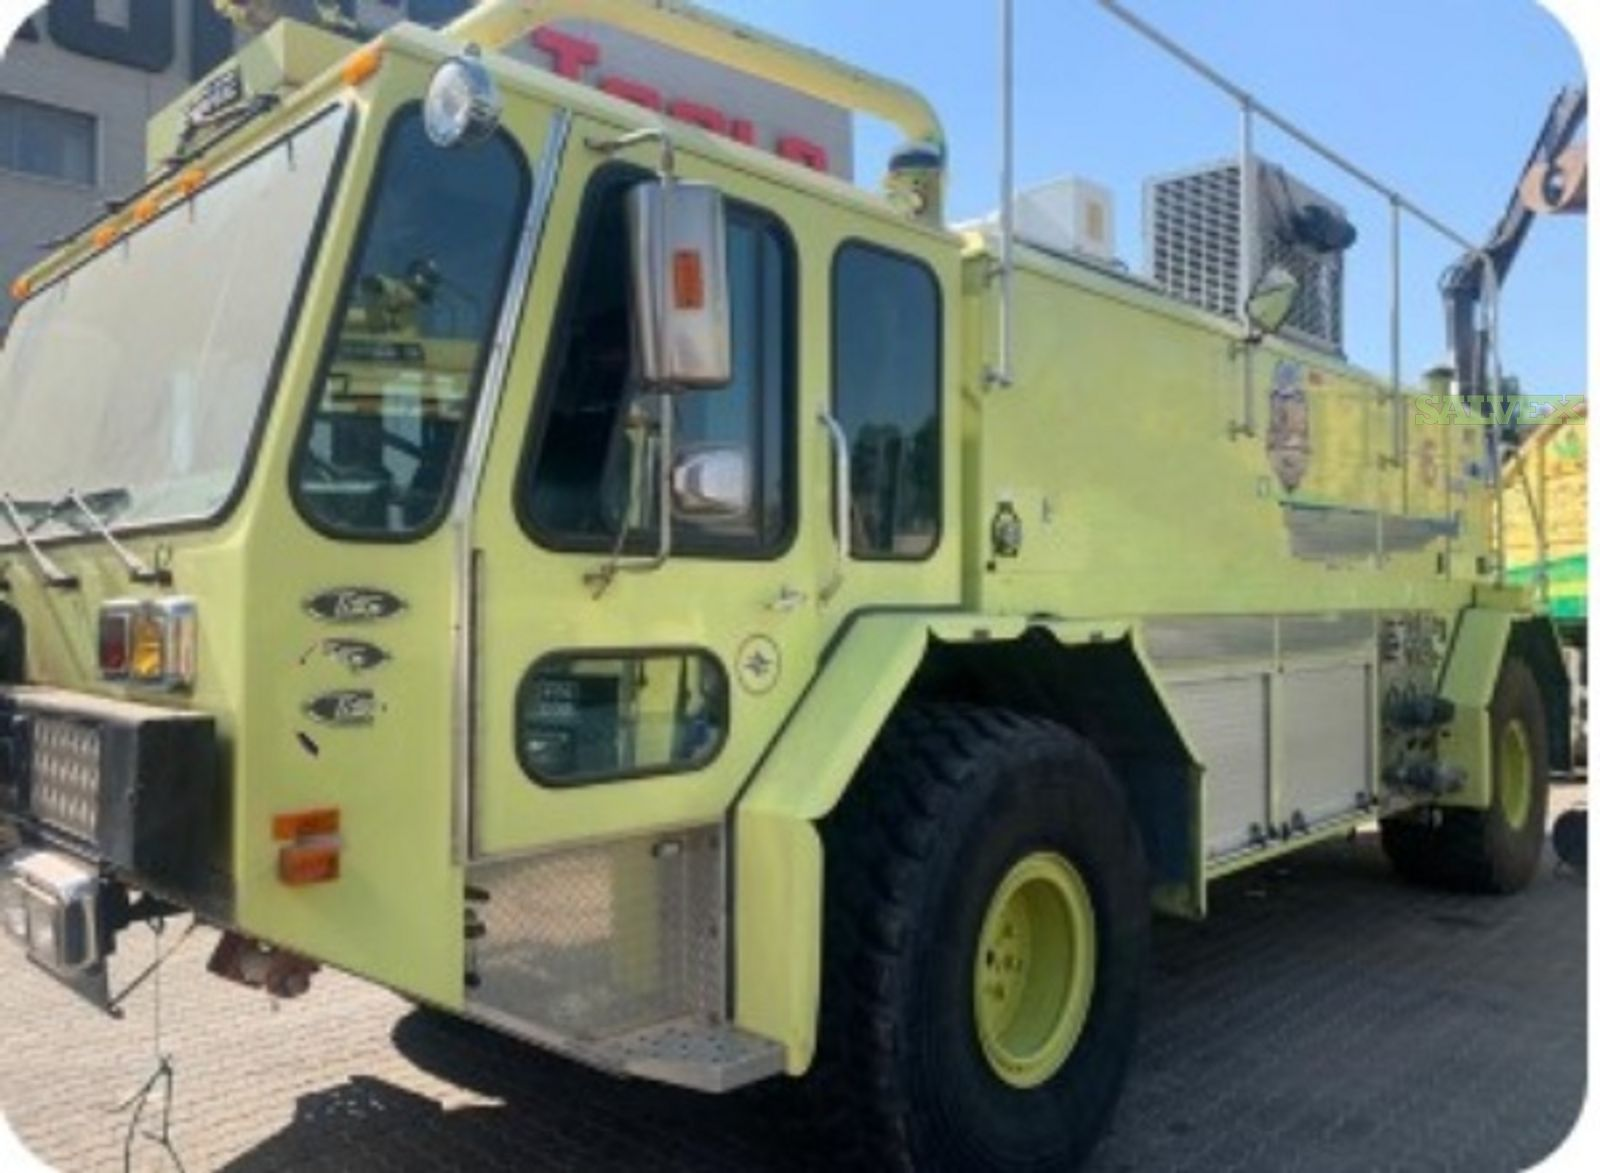 E-One ARFF Vehicle 801 Fire Truck 1995 & 2007 (2 Units)